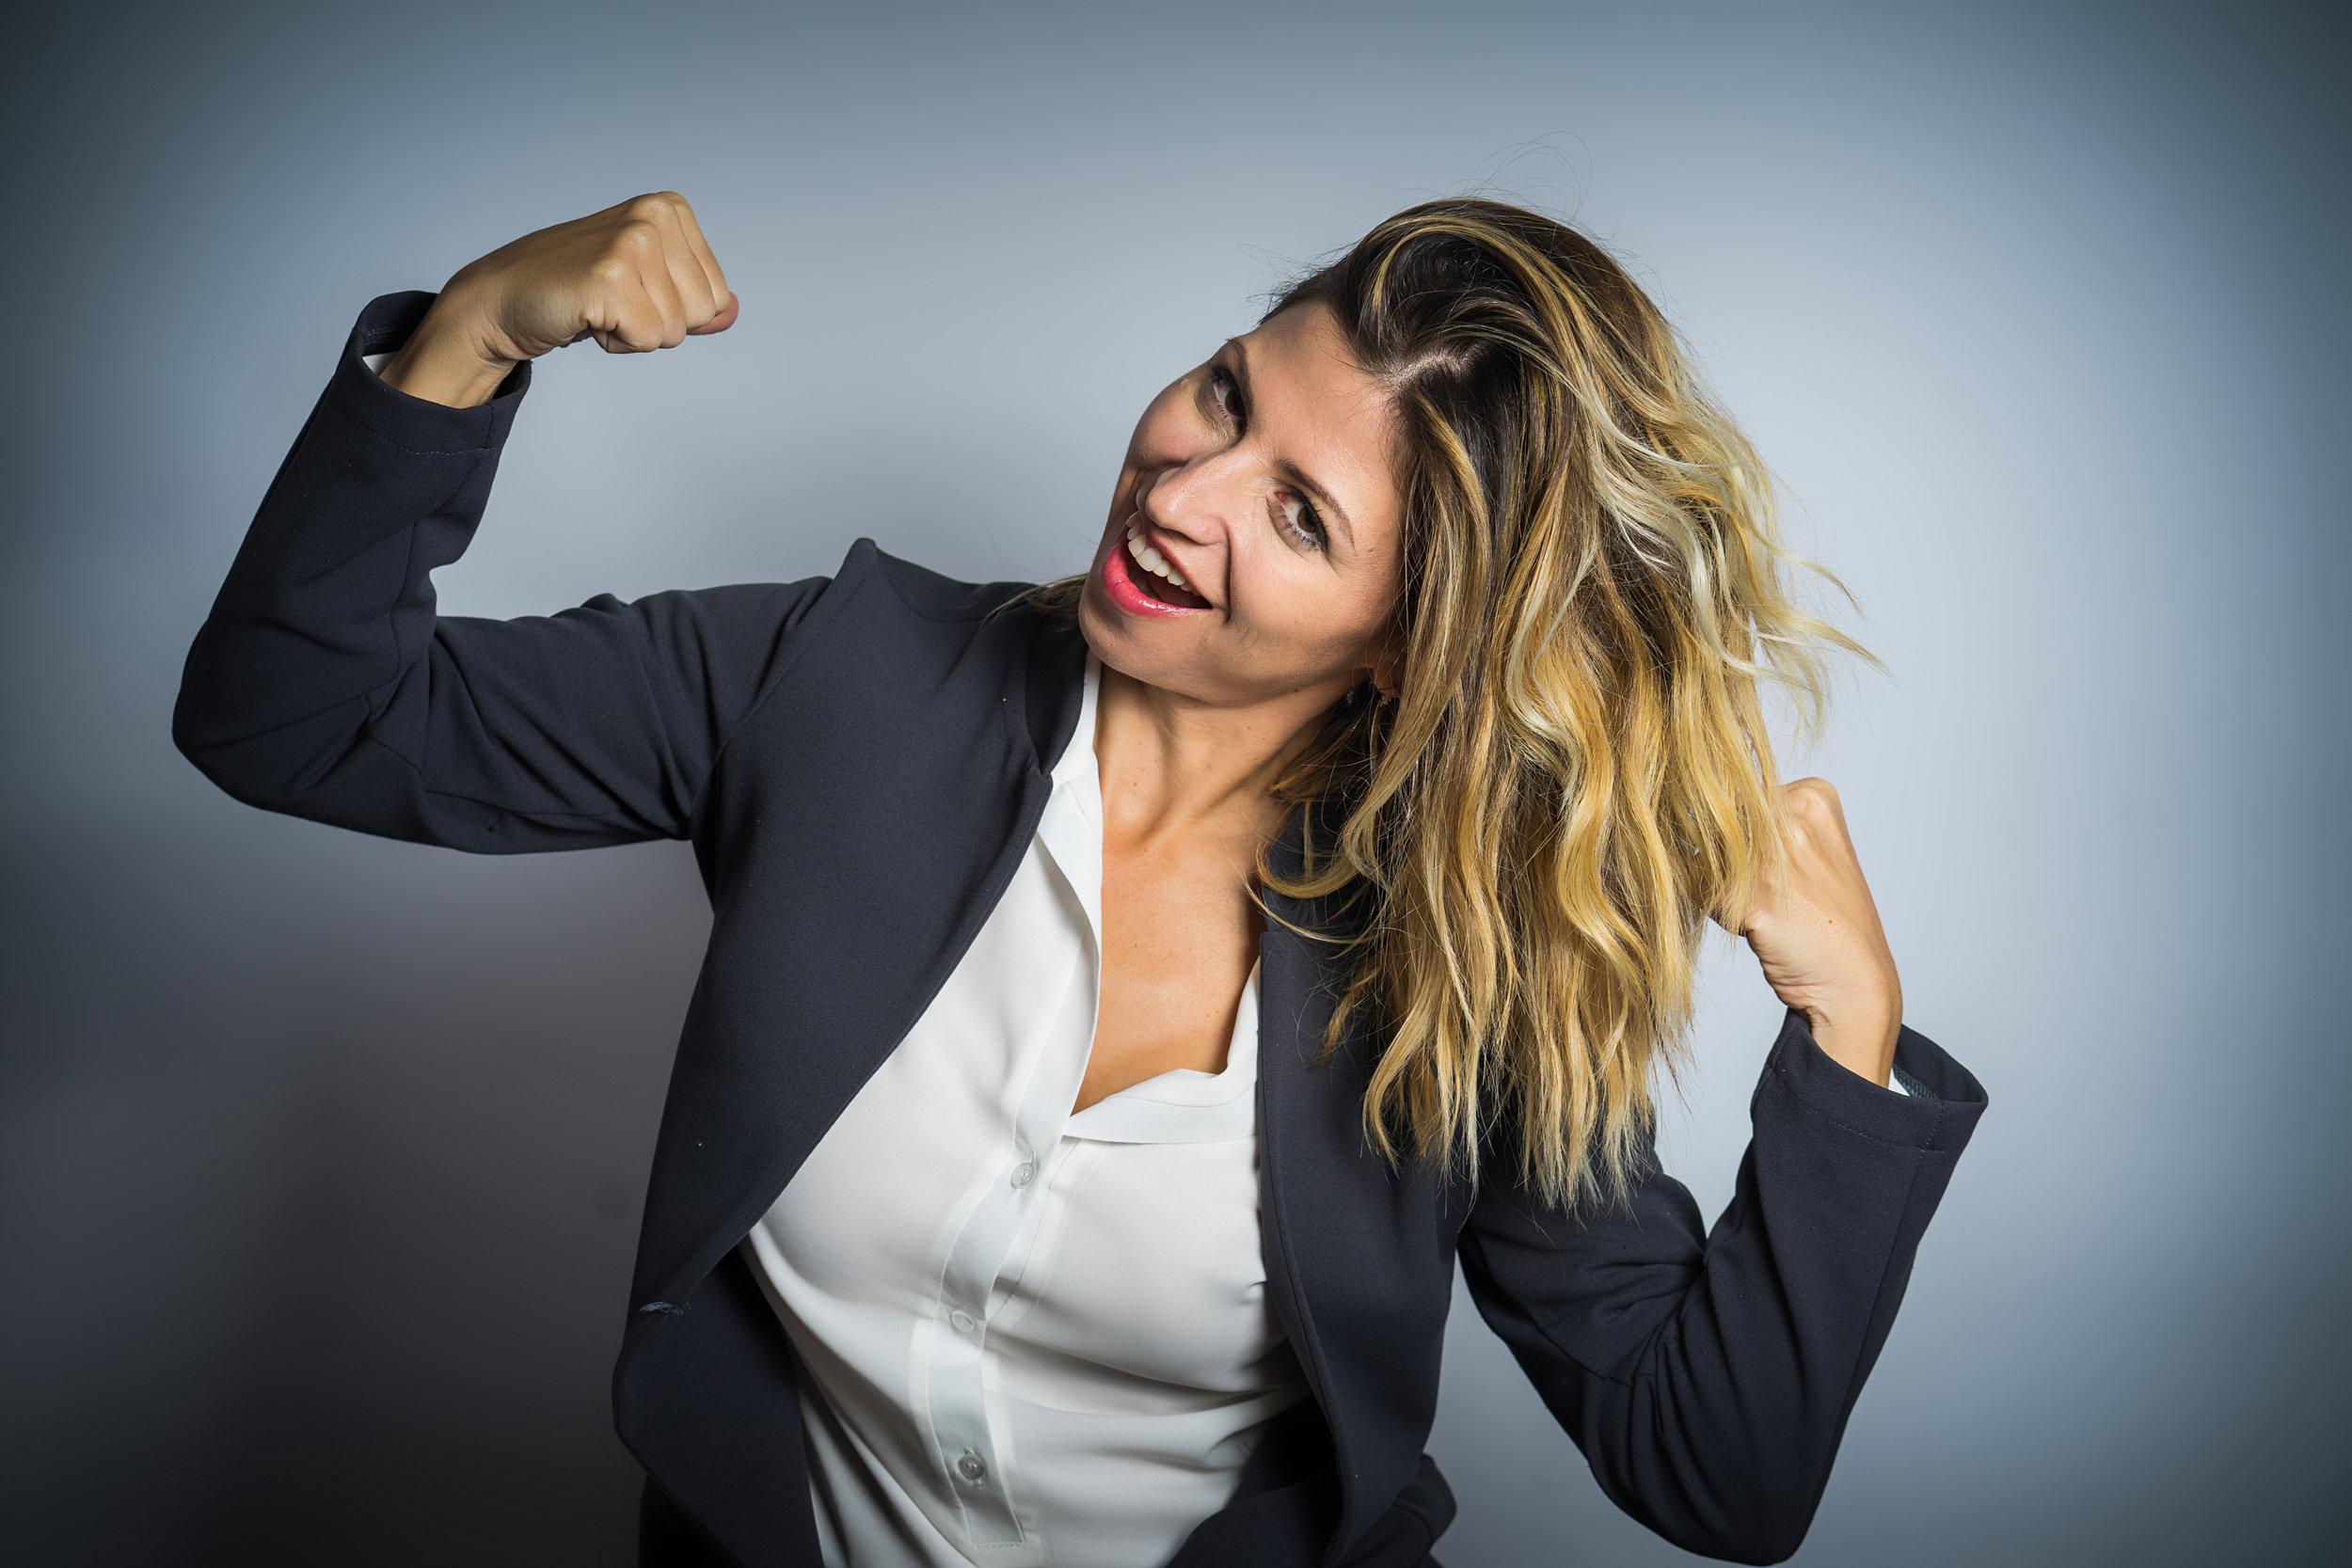 Mirav Woman Entrepreneur